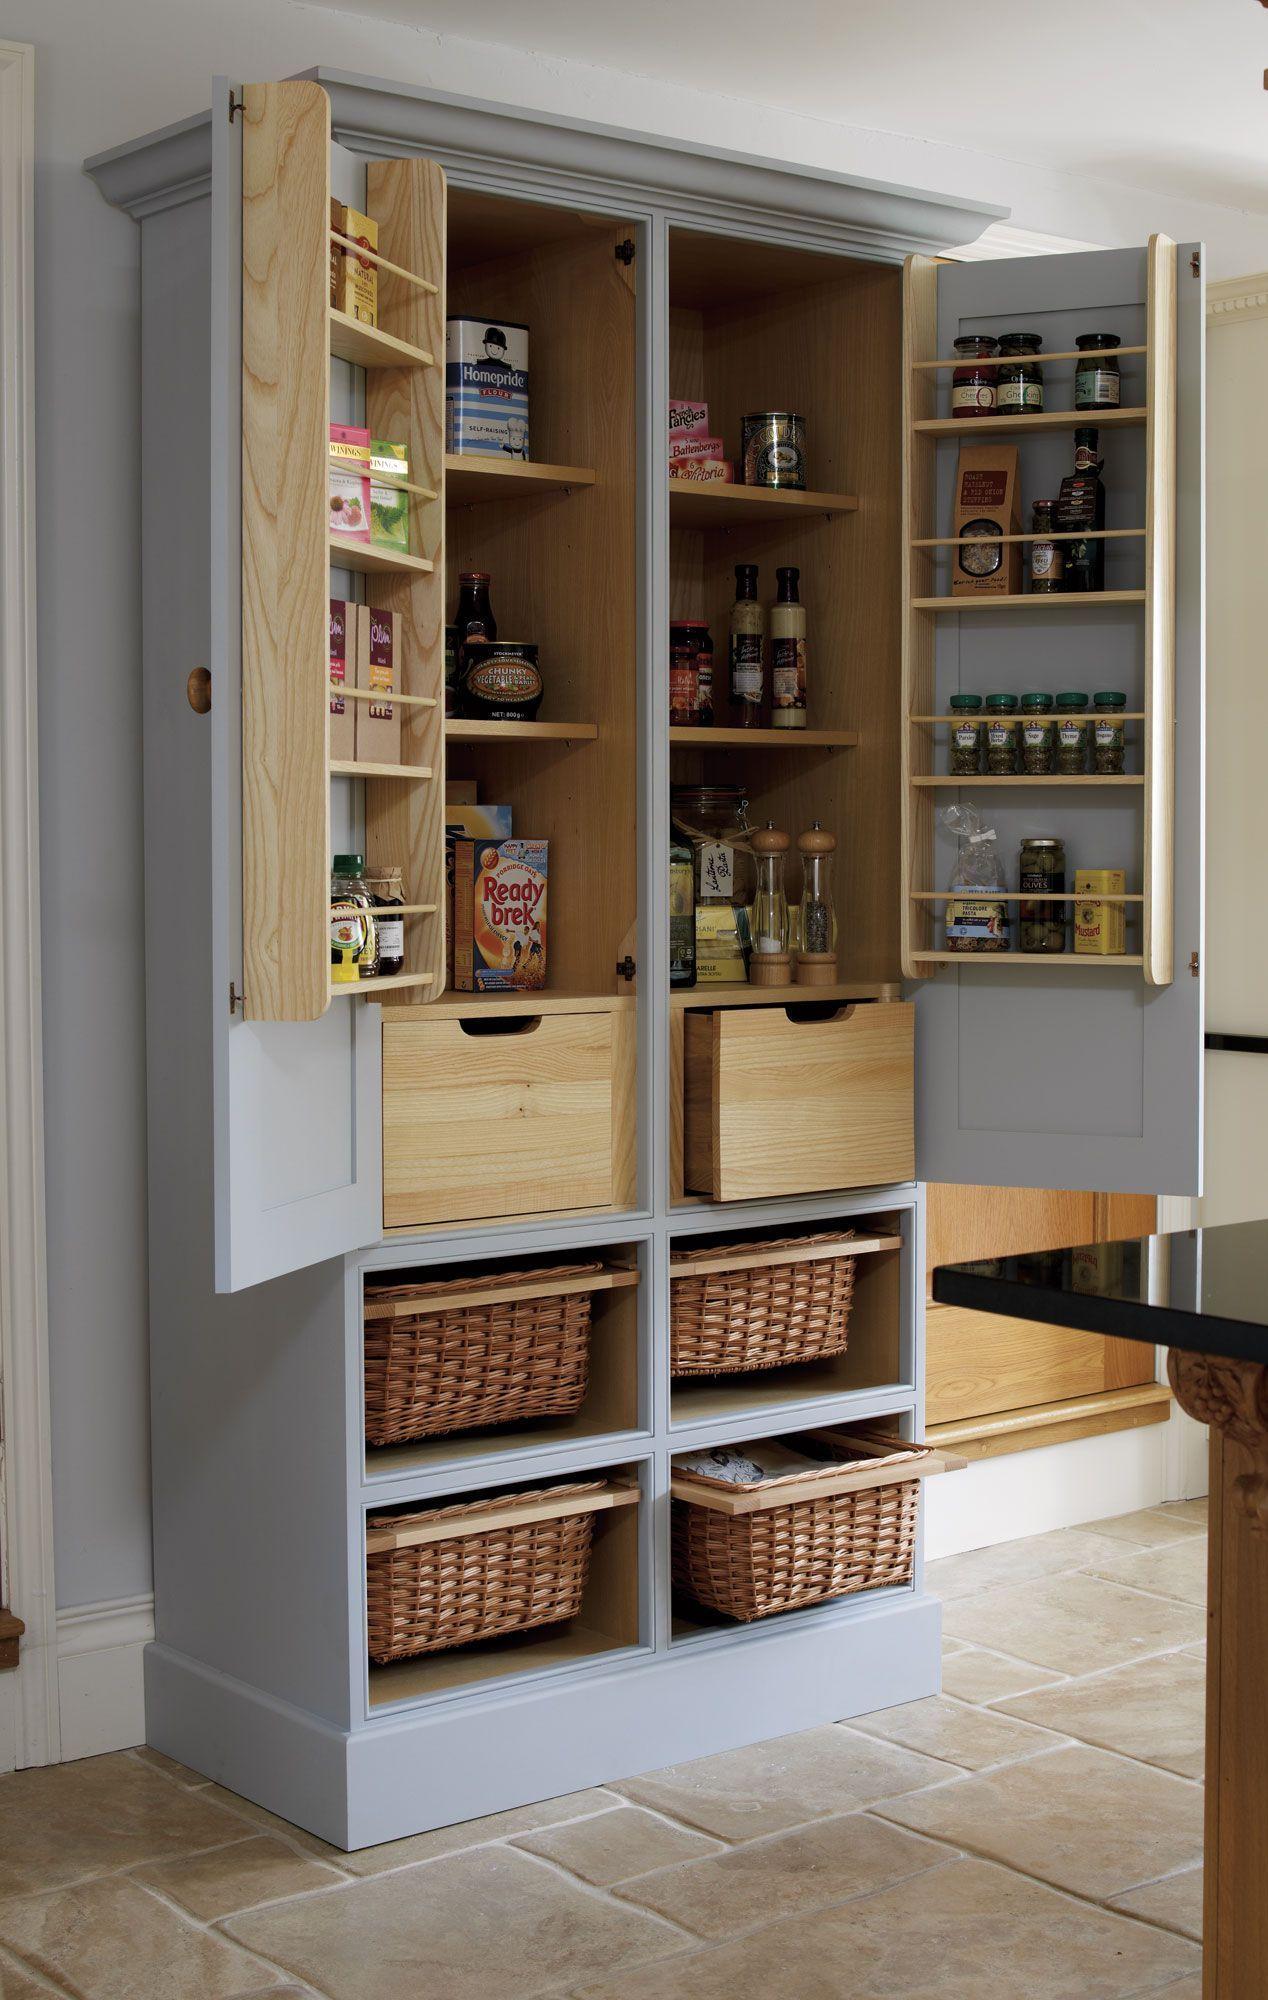 49 Fancy Kitchen Pantry Designs Ideas Free Standing Kitchen